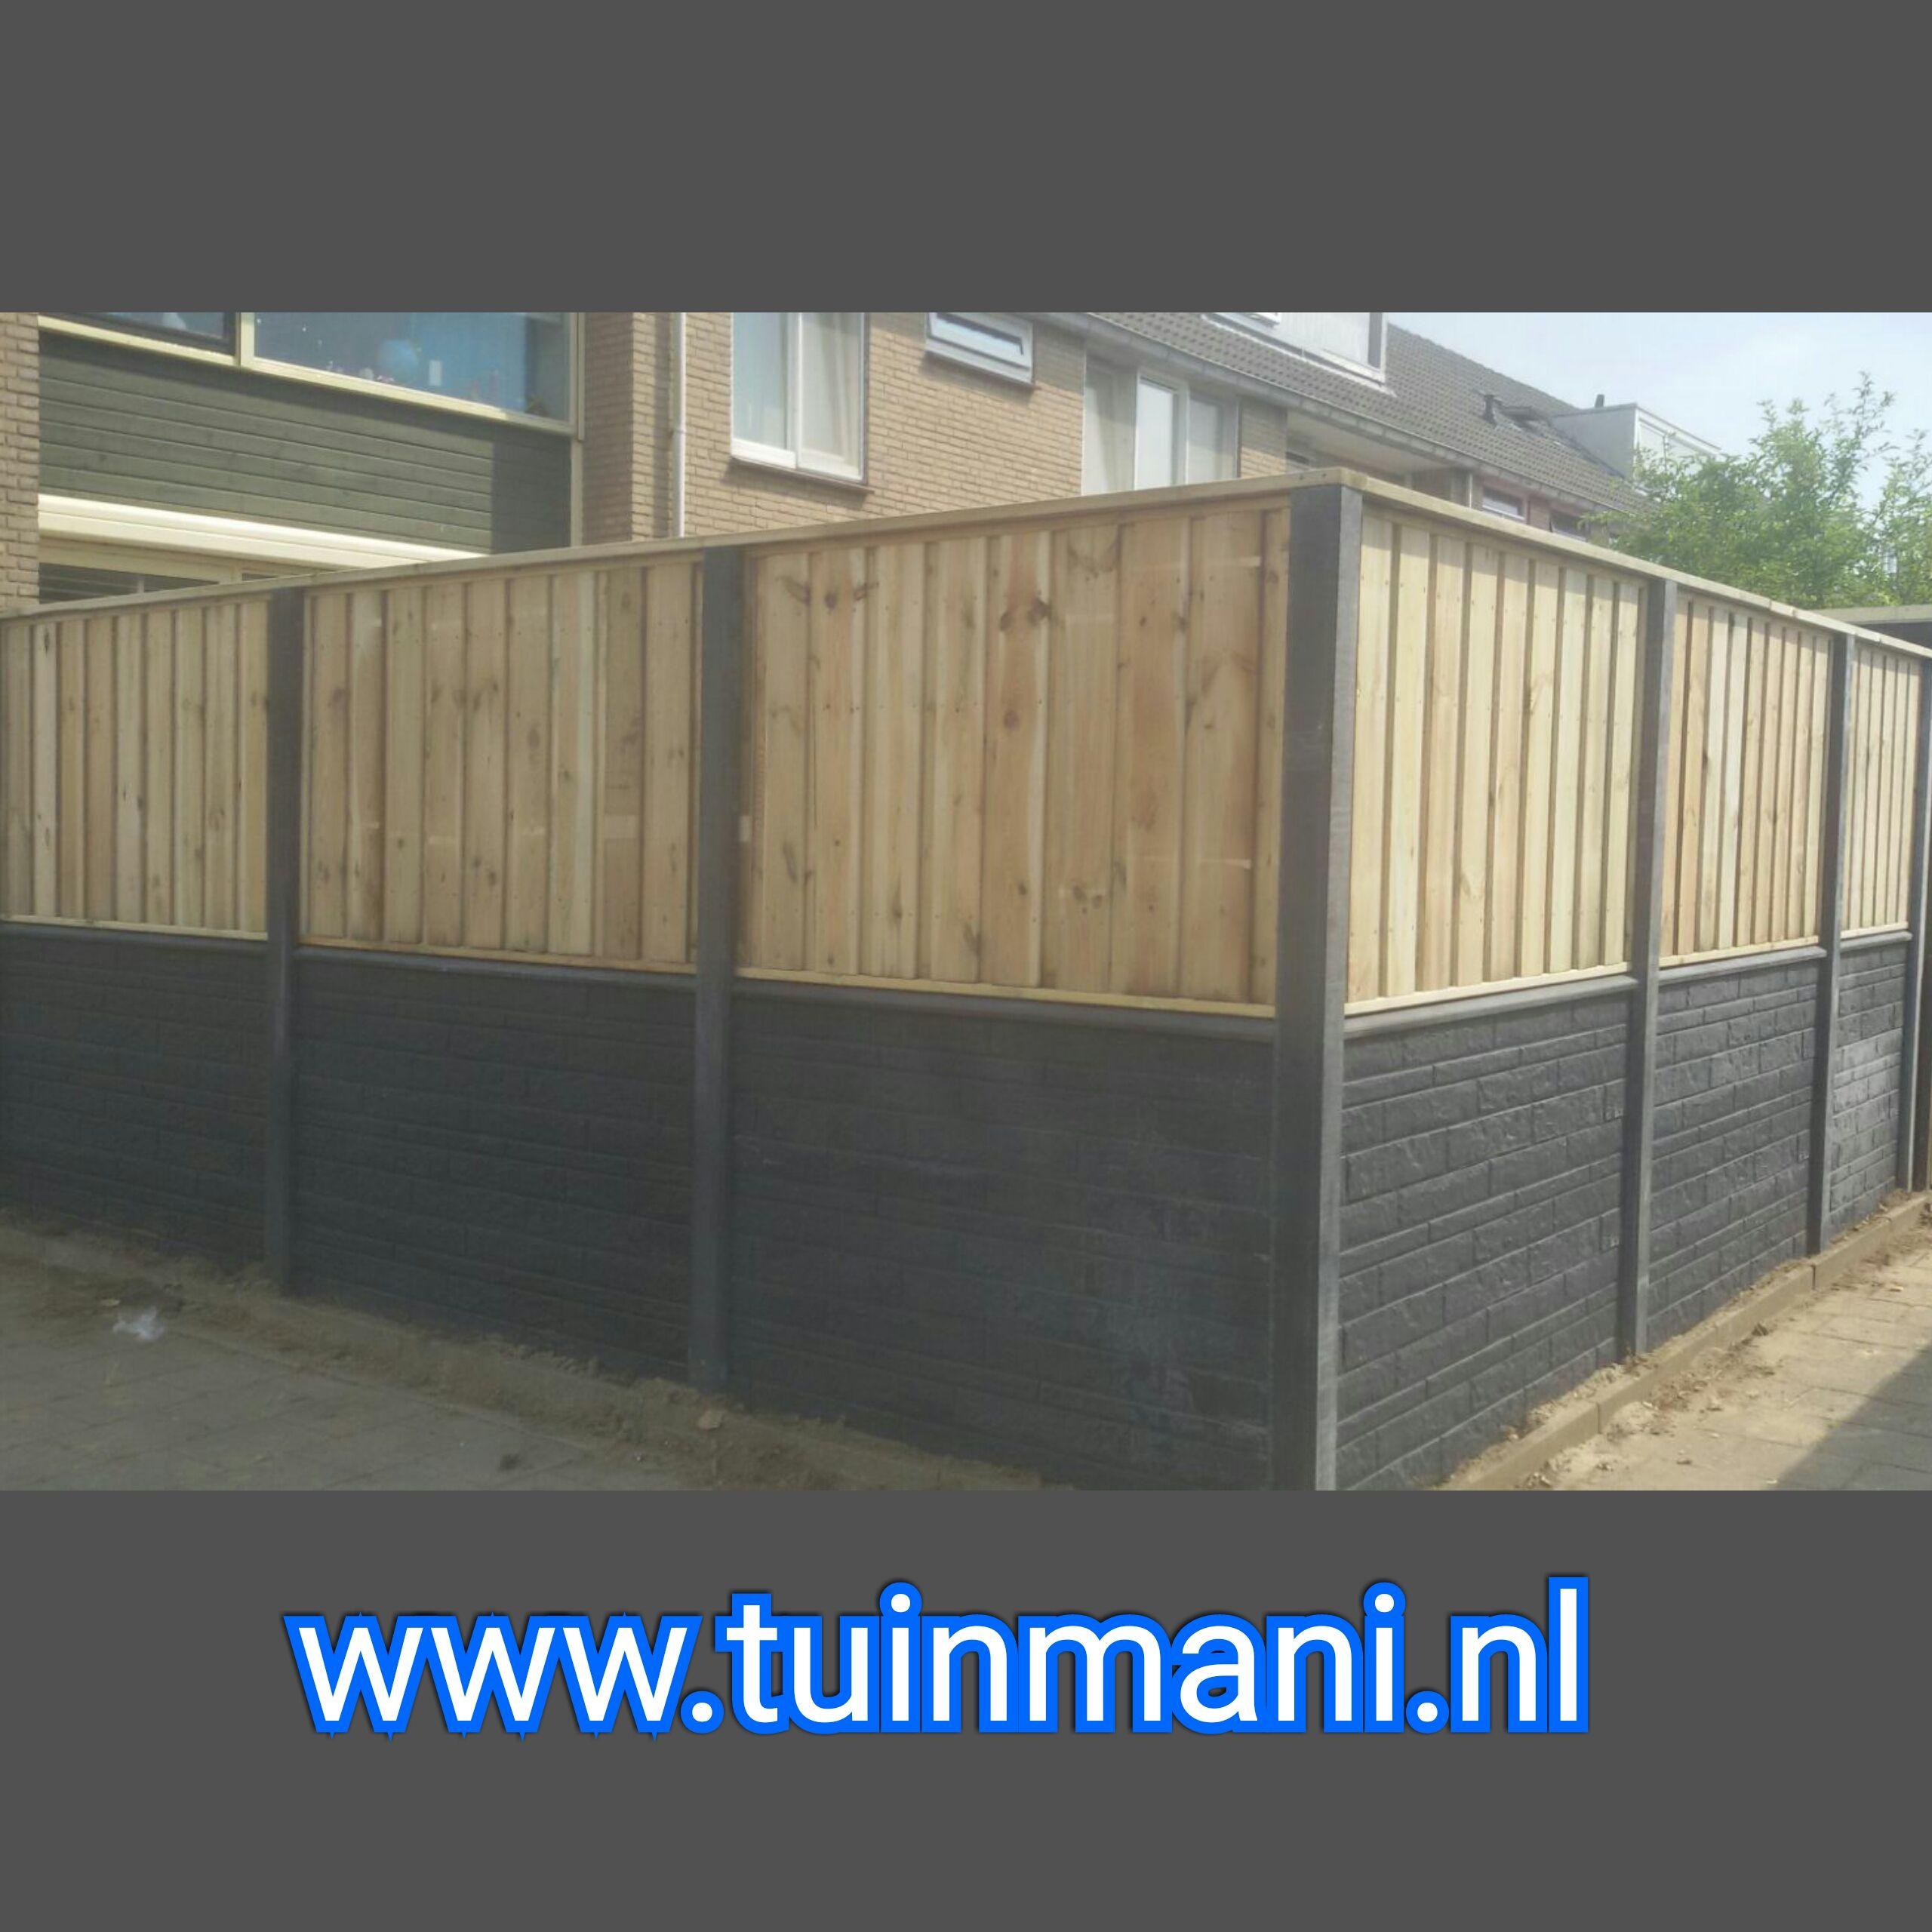 Tuinscherm Multi Grenen Recht 180x180cm Achtertuin Tuin Multi